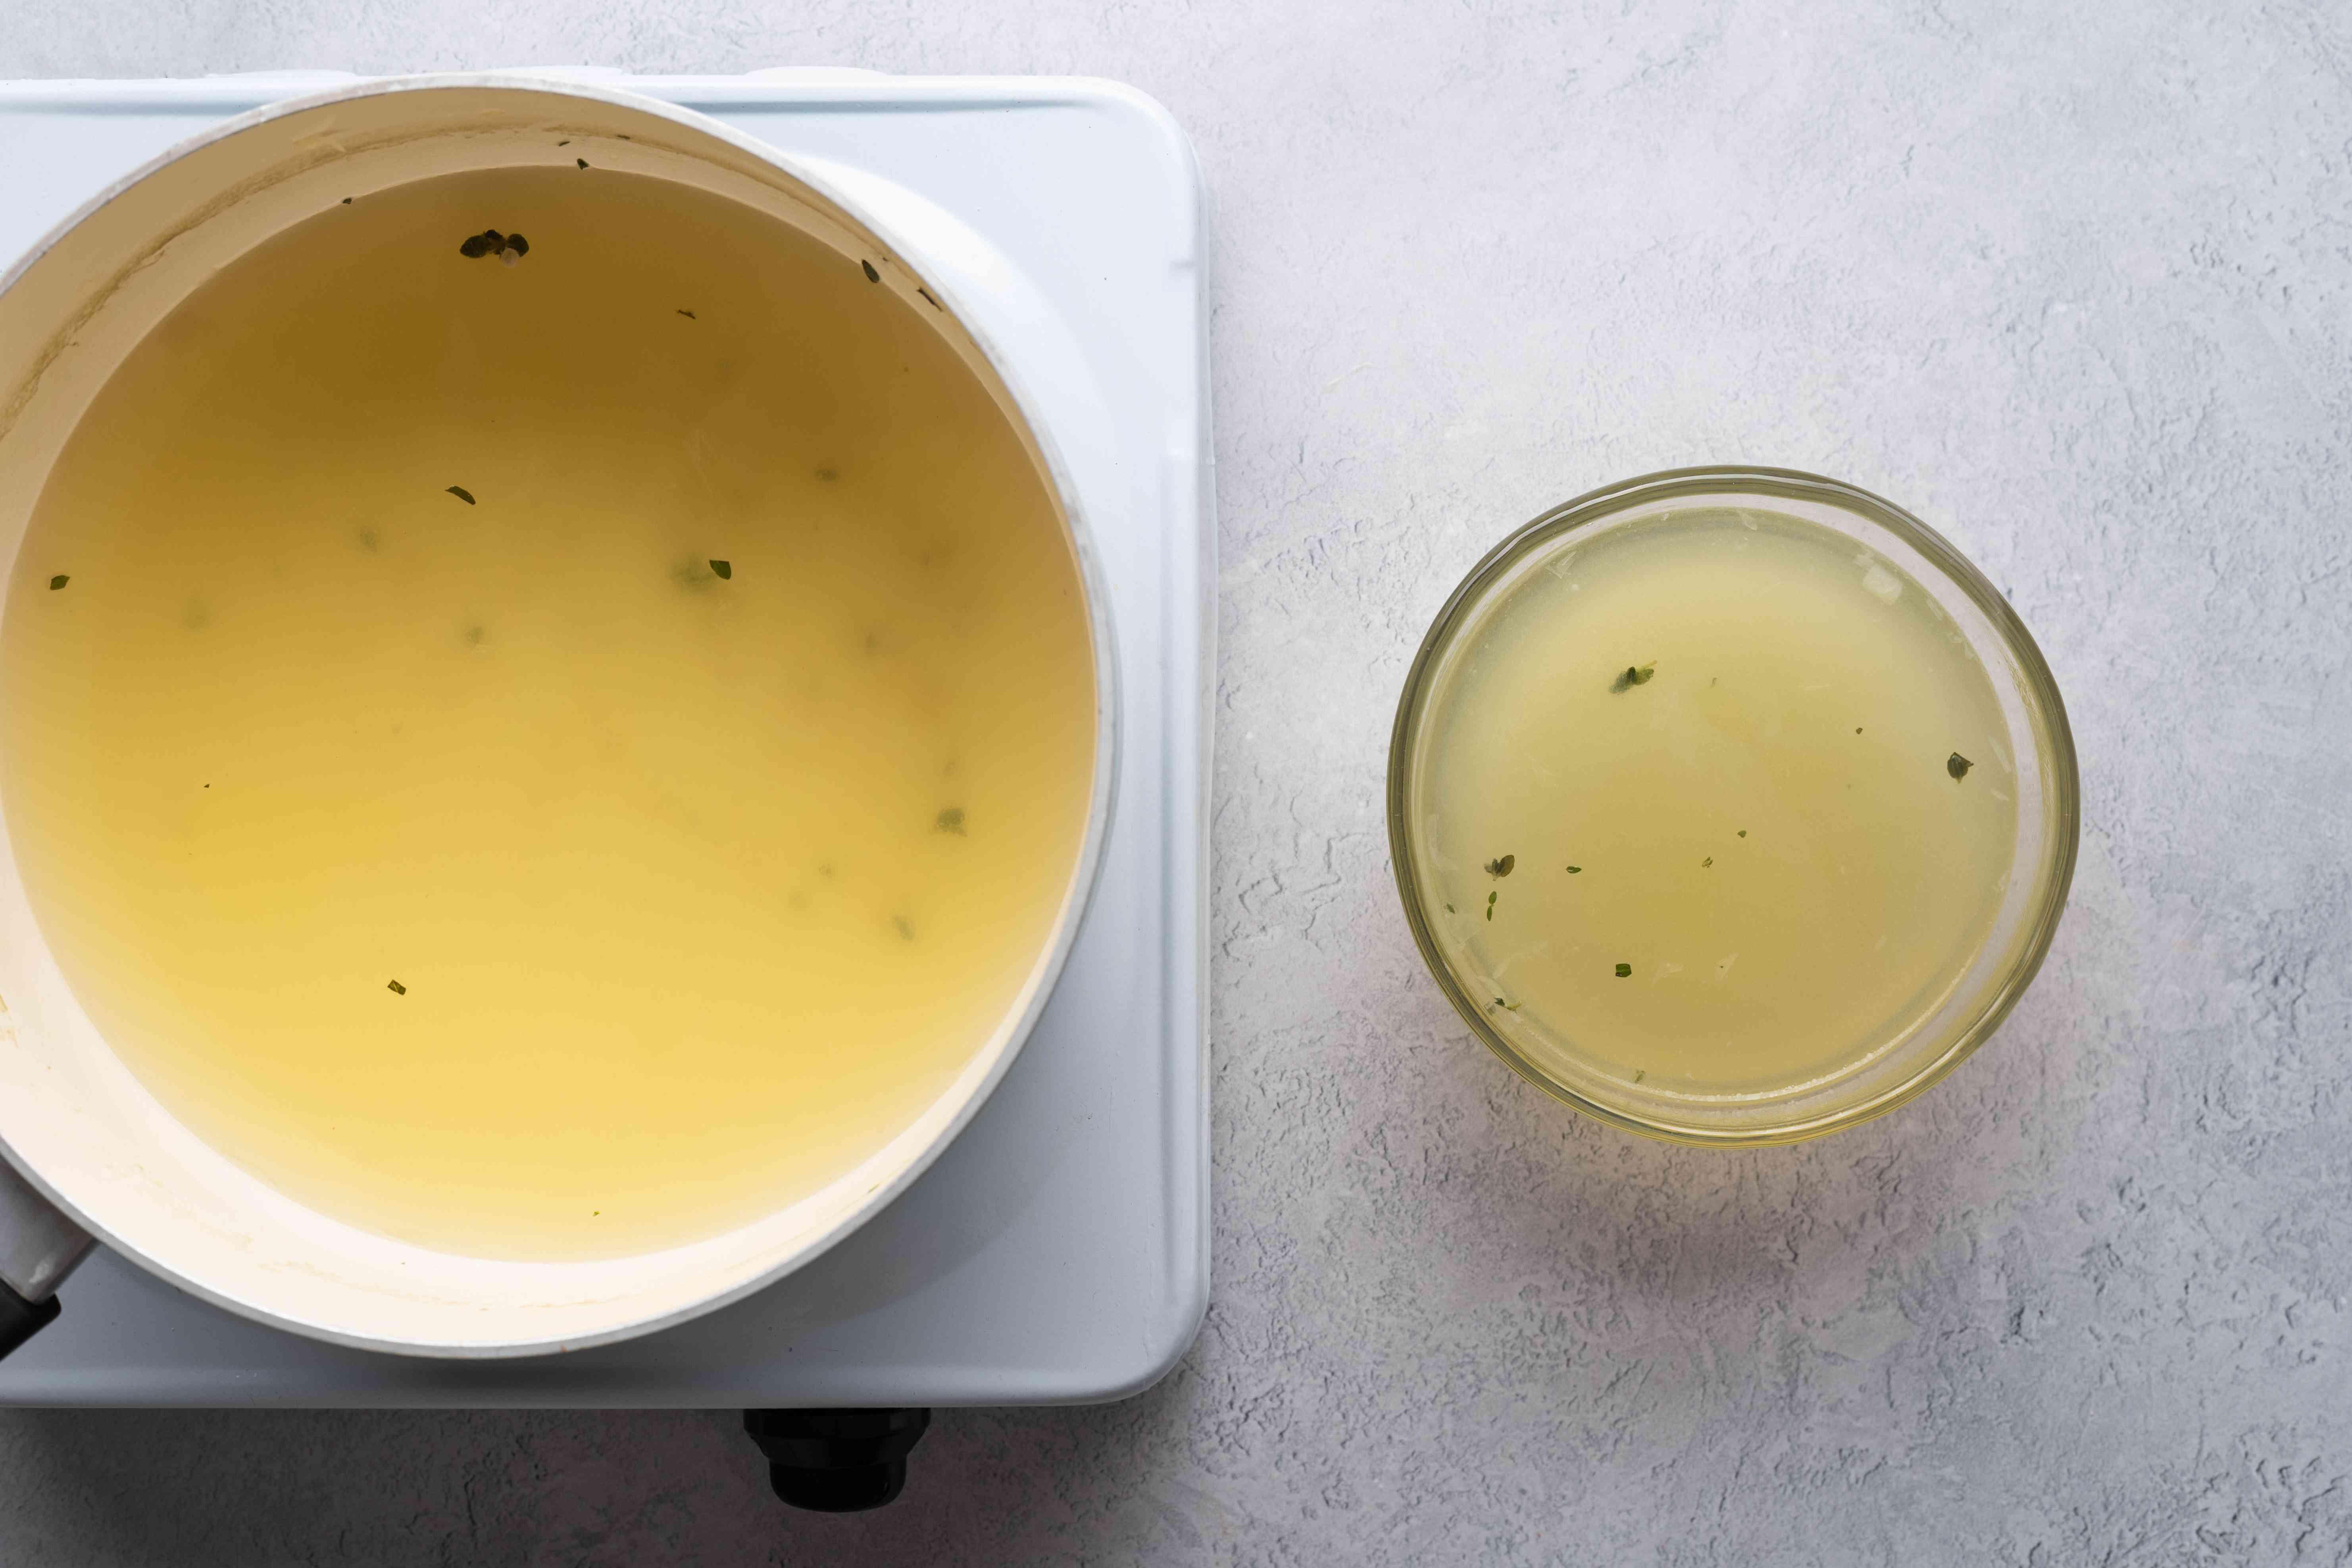 okra liquid in a bowl